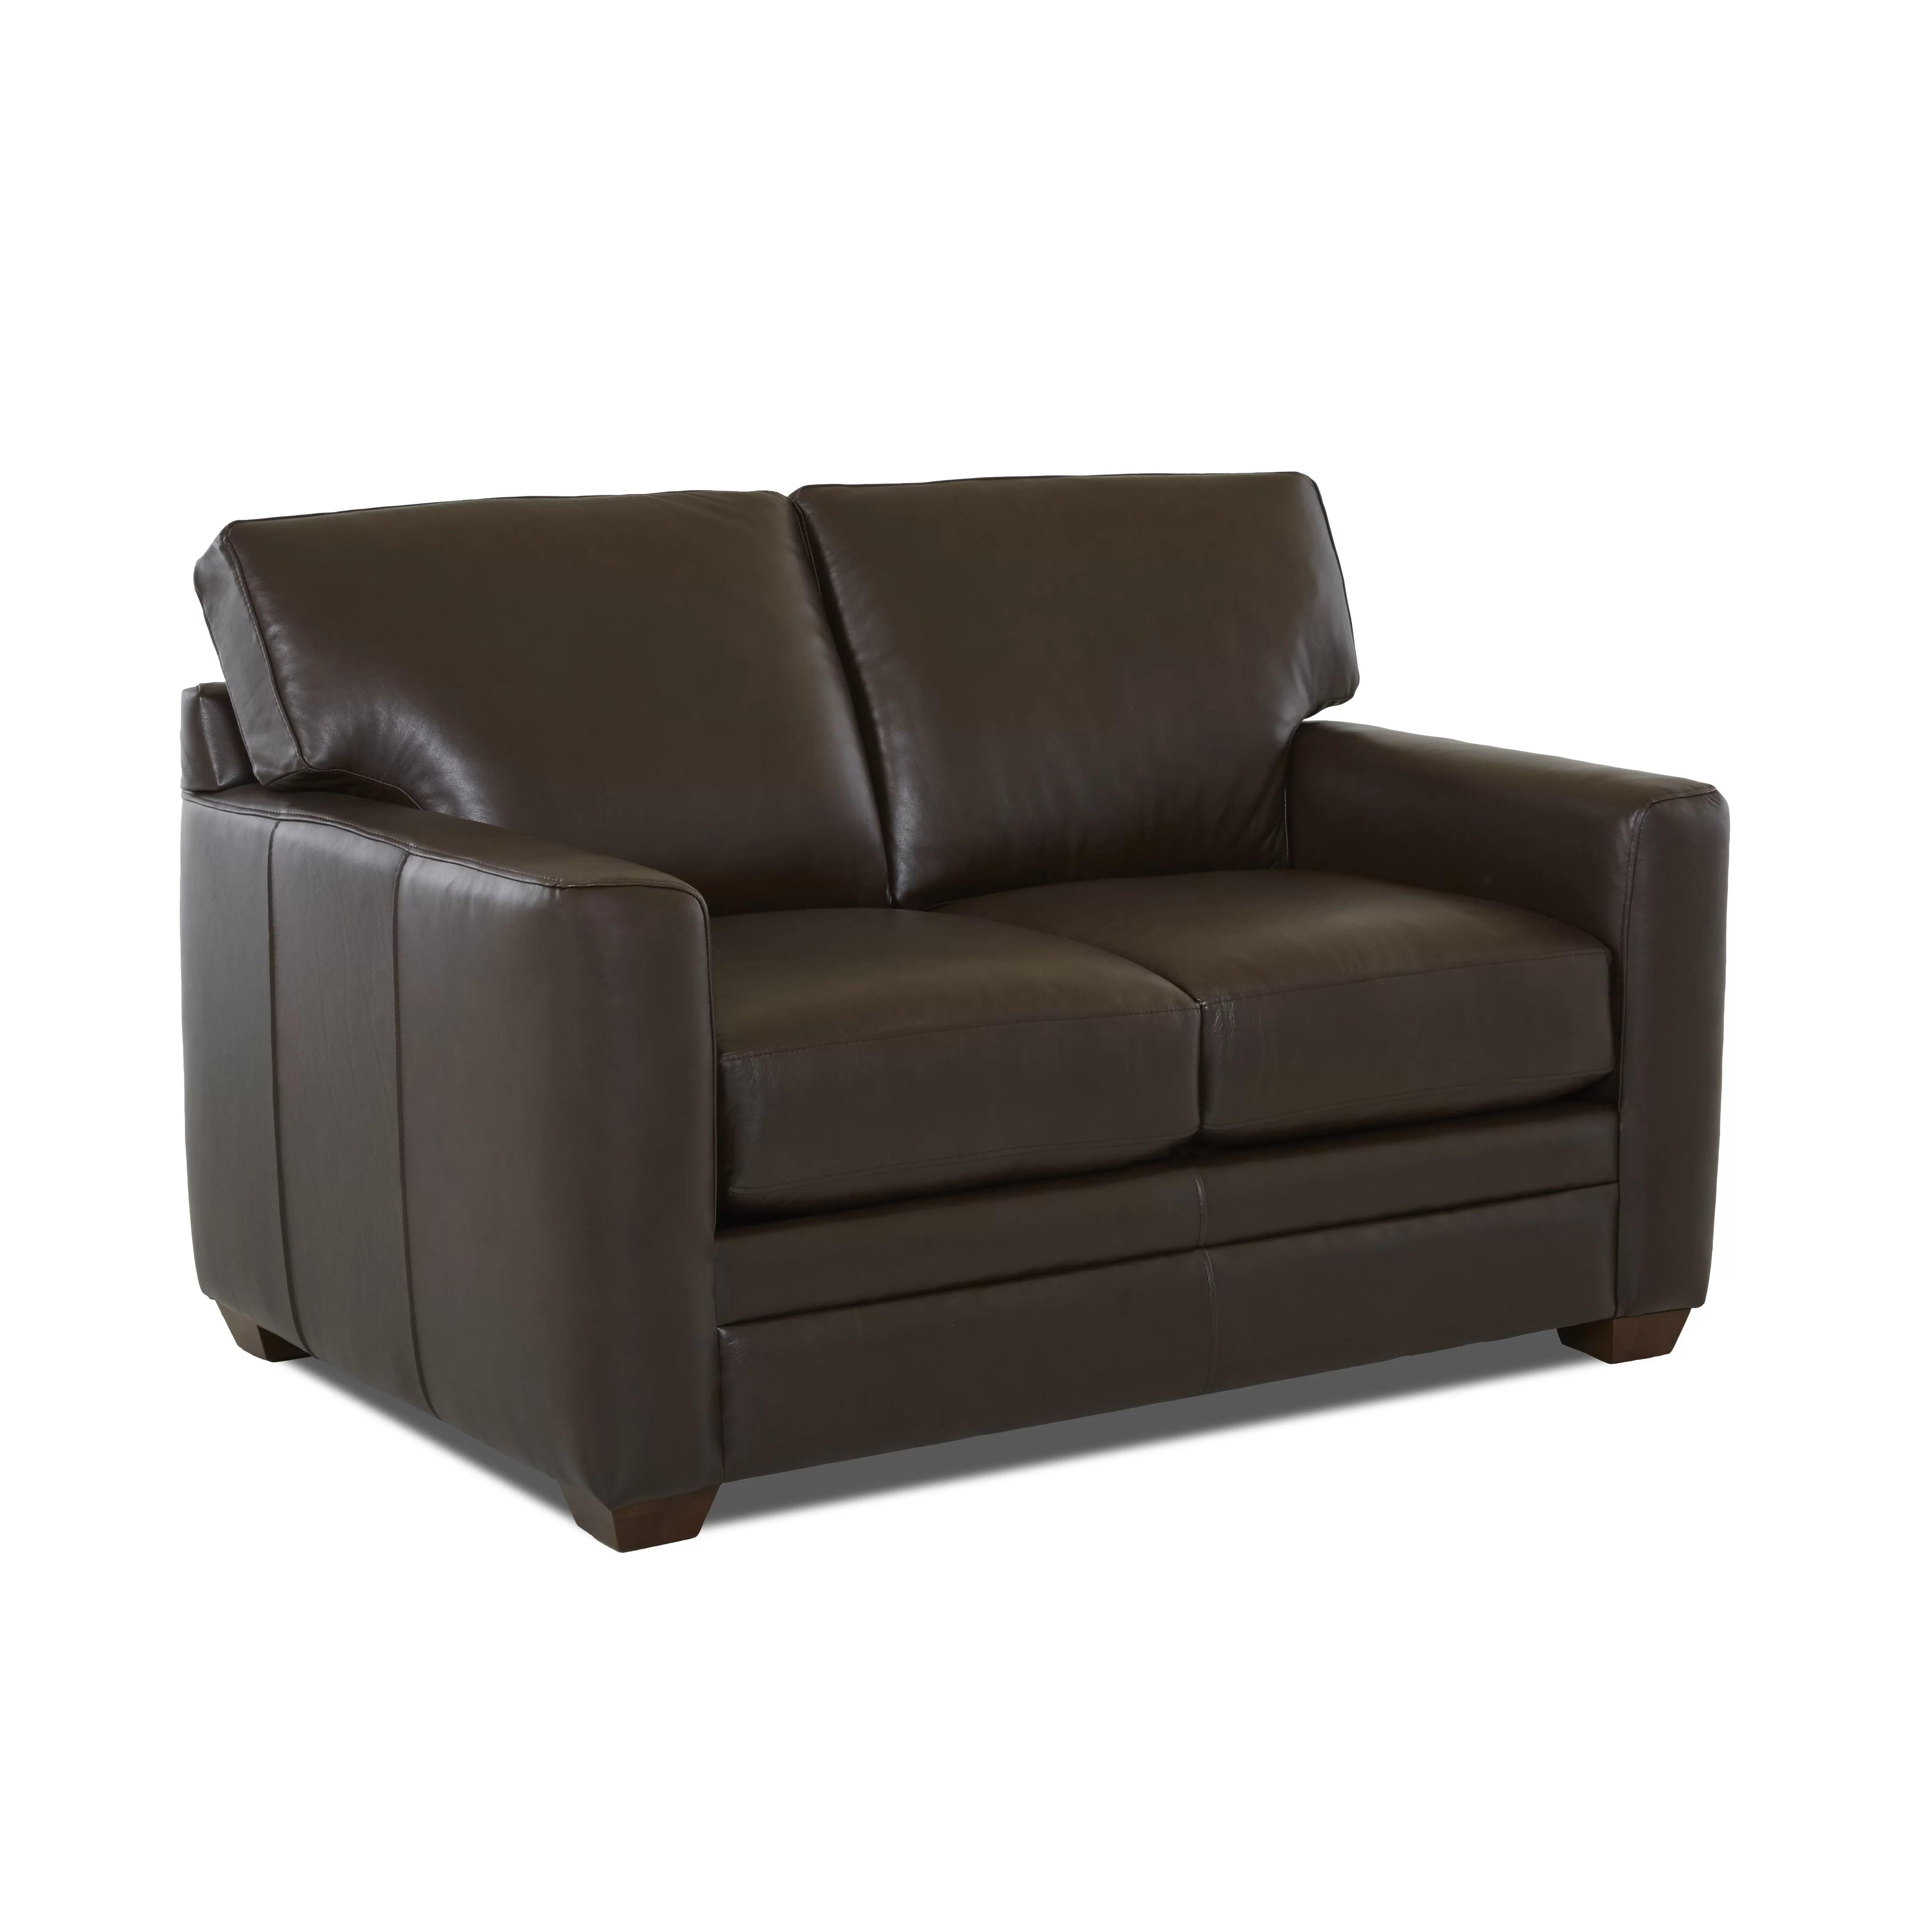 sofas at wayfair plush hudson sofa review custom upholstery jennifer leather and reviews